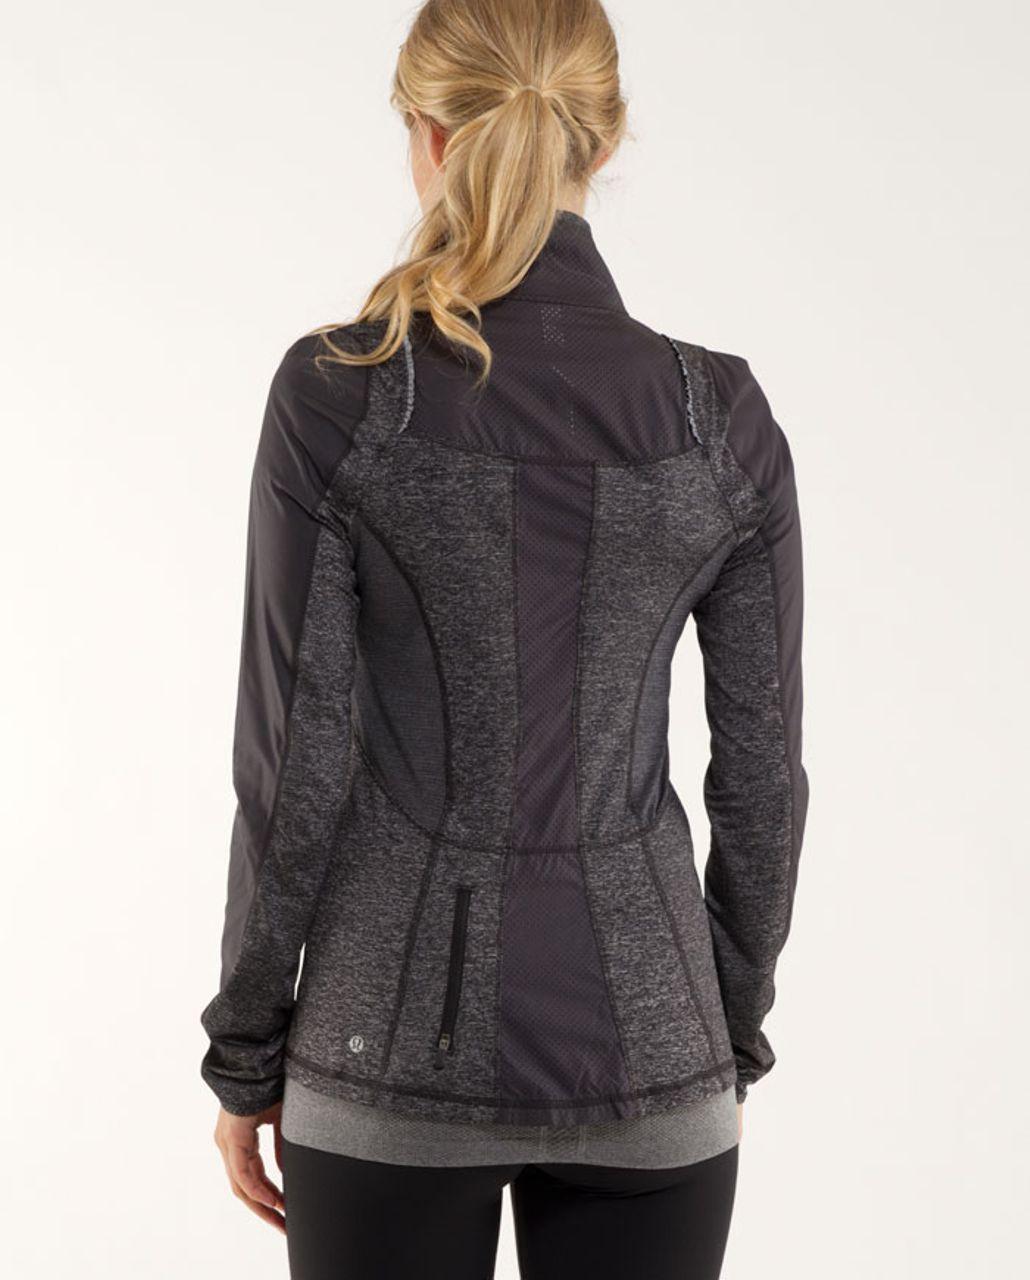 Lululemon Run:  Featherweight Hybrid Jacket - Black